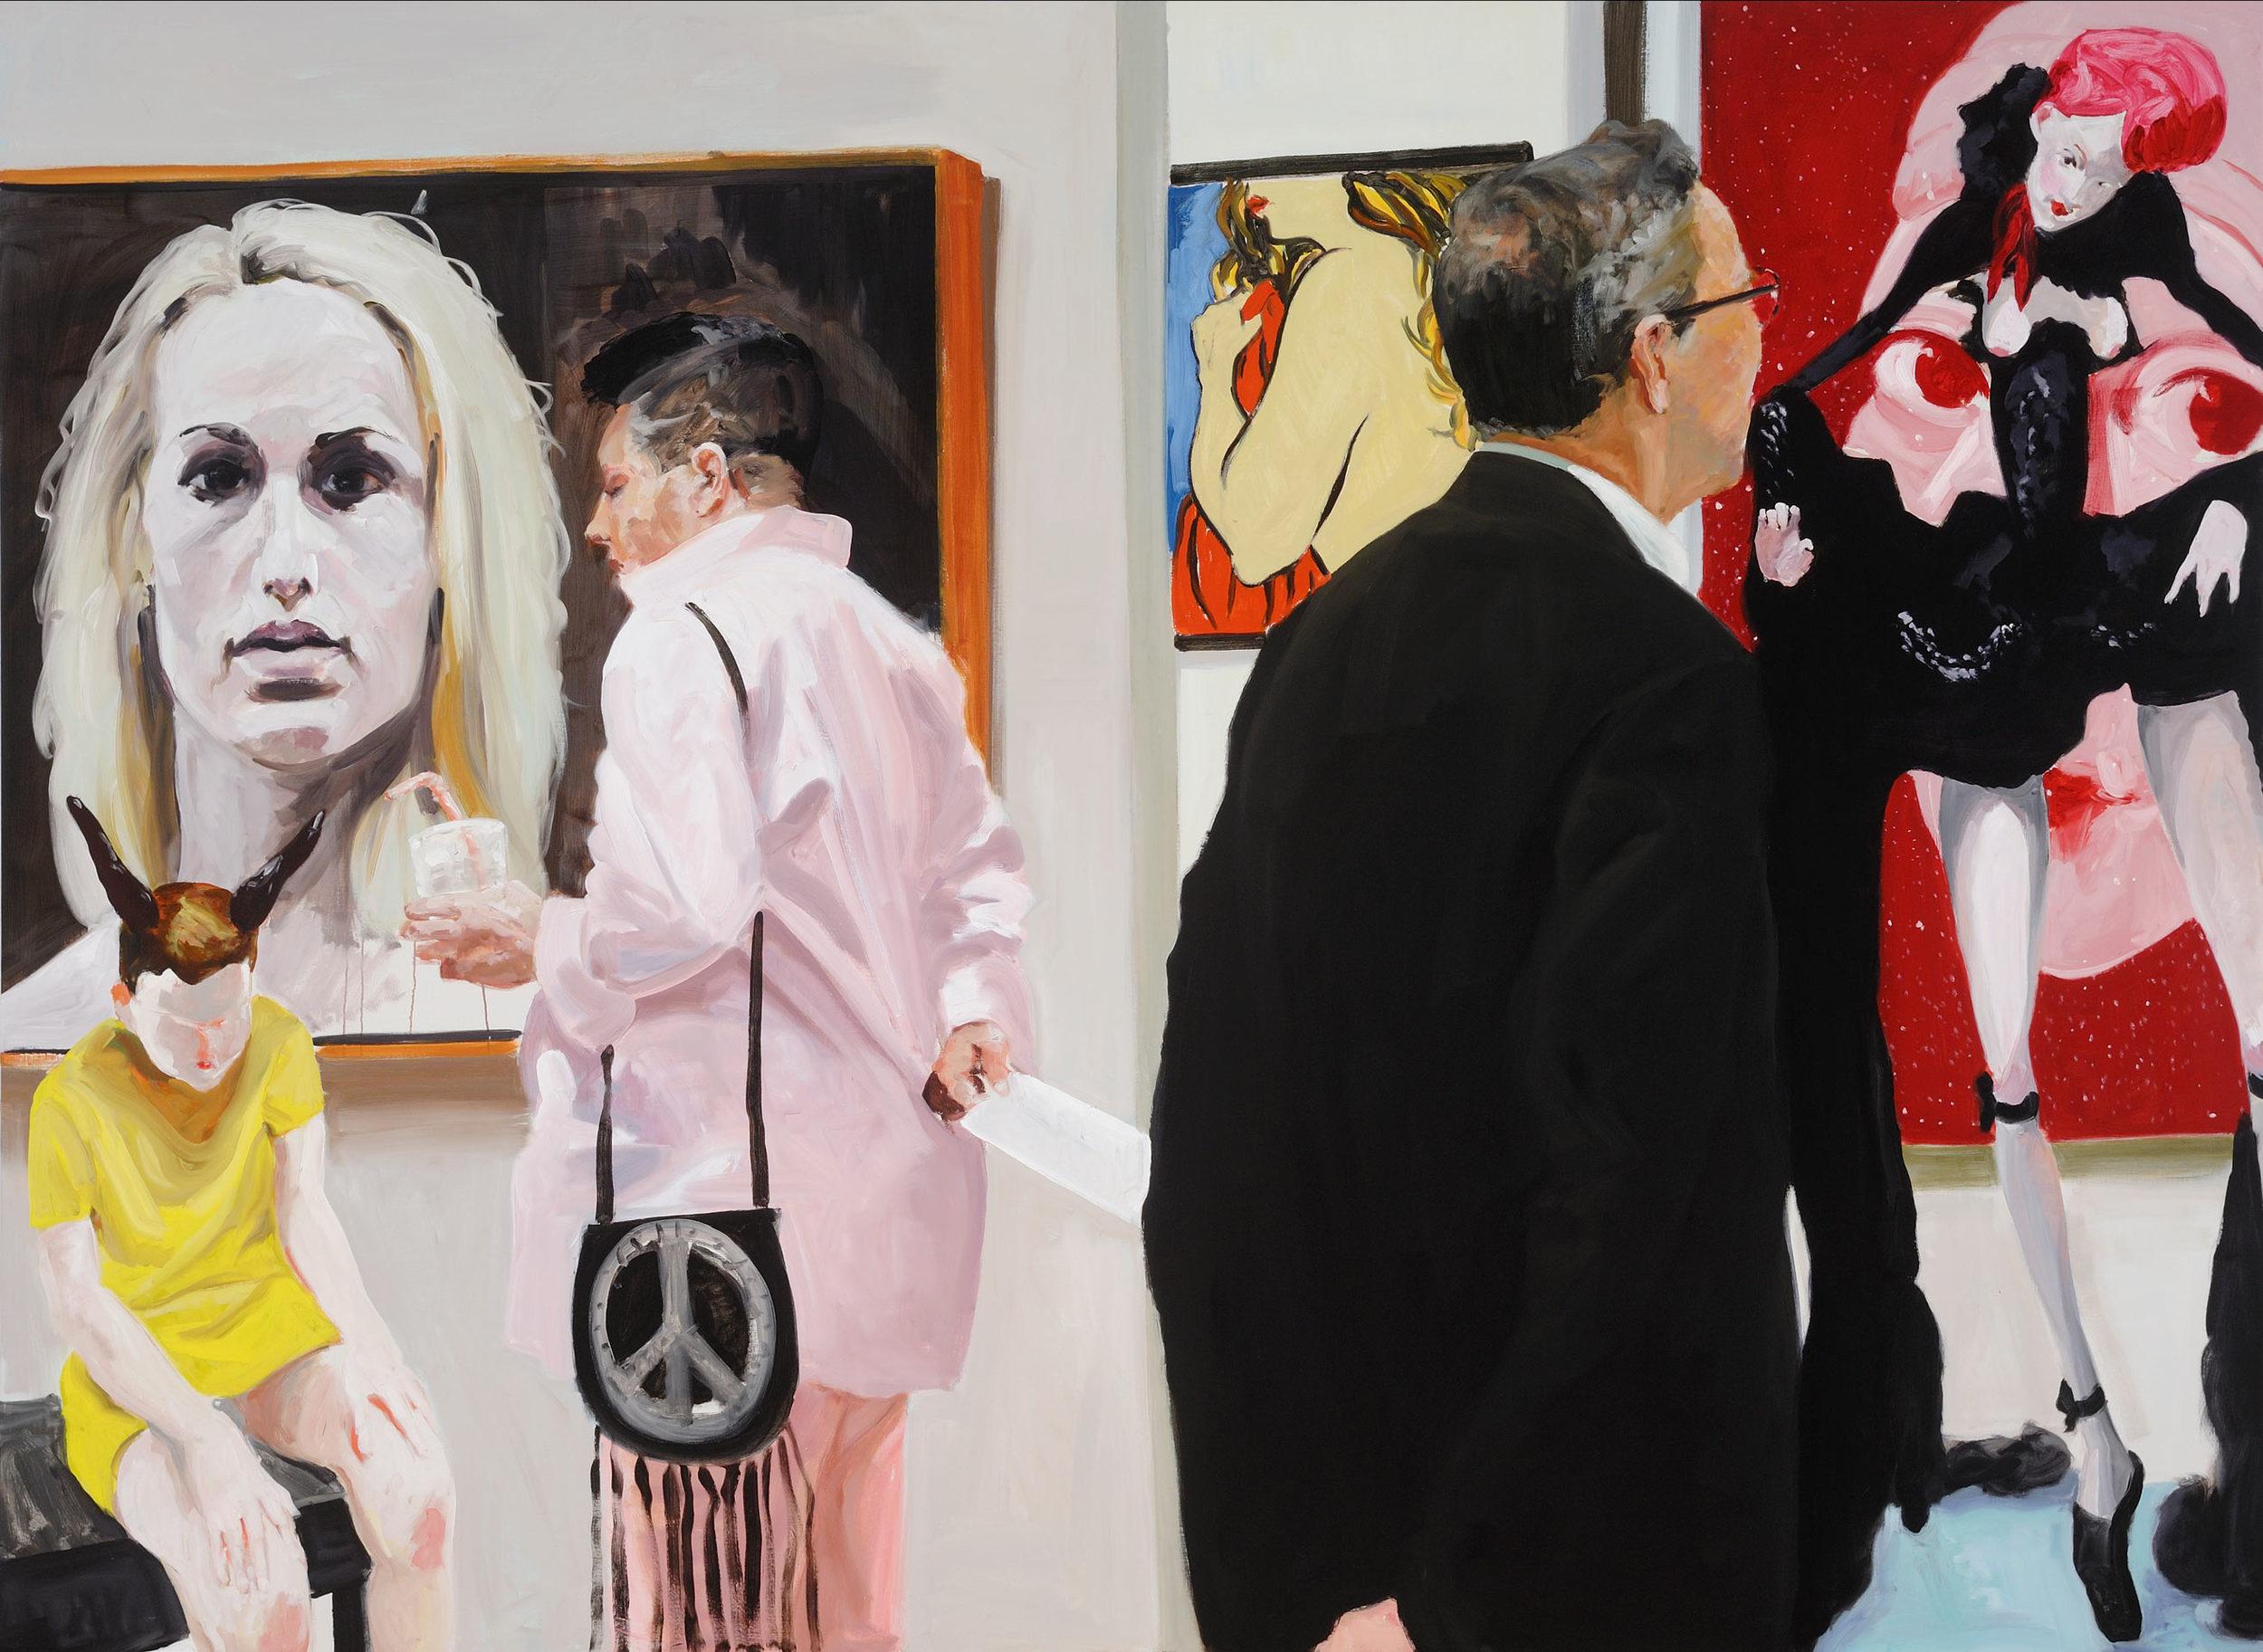 Art Fair: Booth #10 Booty, 2014. Oil on Linen. 82 x 112 in. (208 x 284 cm.)